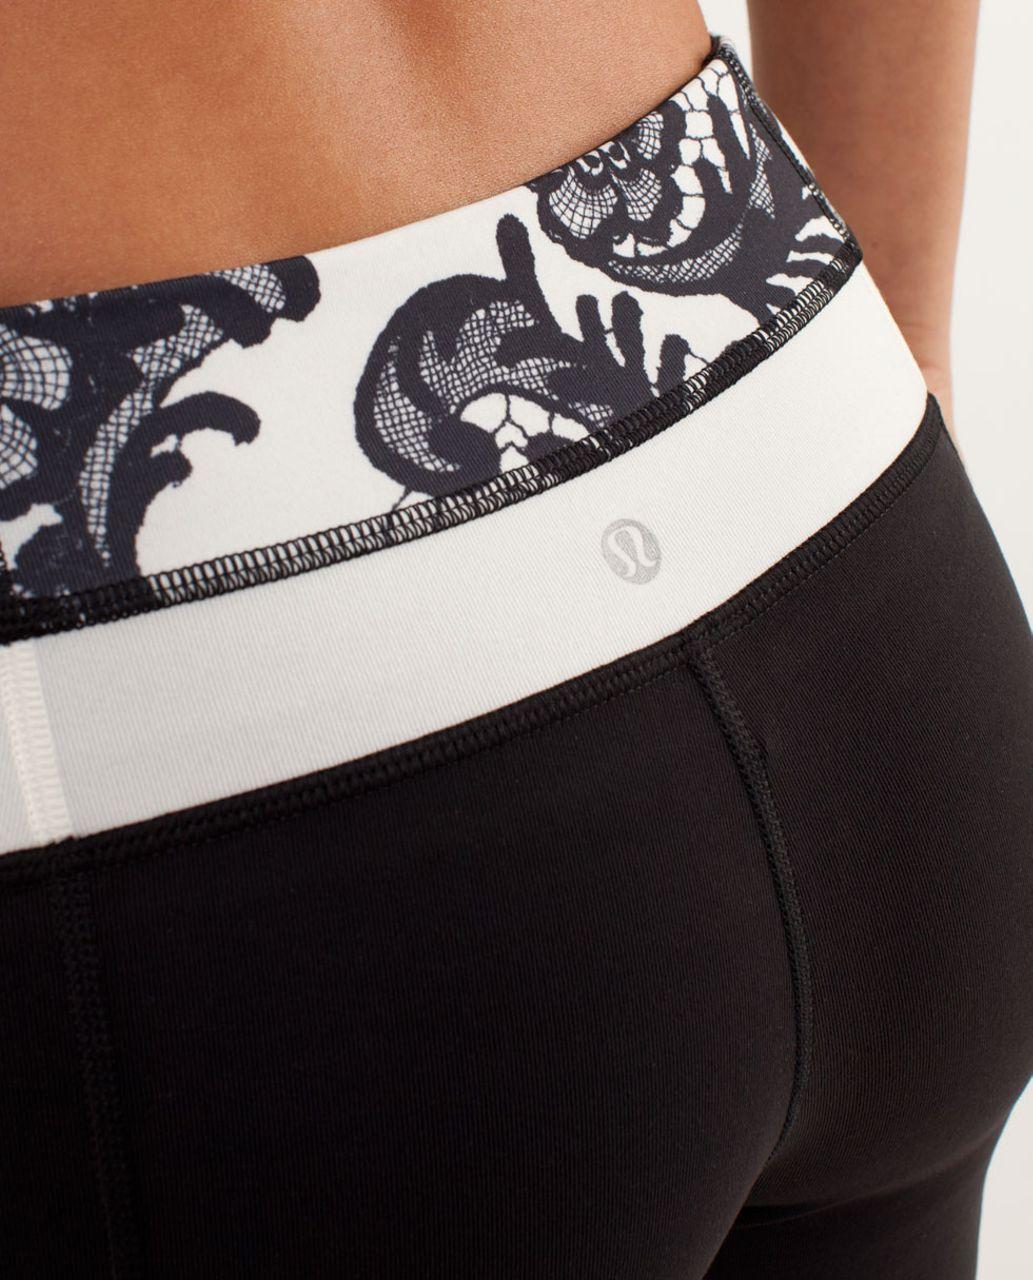 Lululemon Groove Pant *Slim (Regular) - Black / Laceoflage Polar Cream Black / Polar Cream